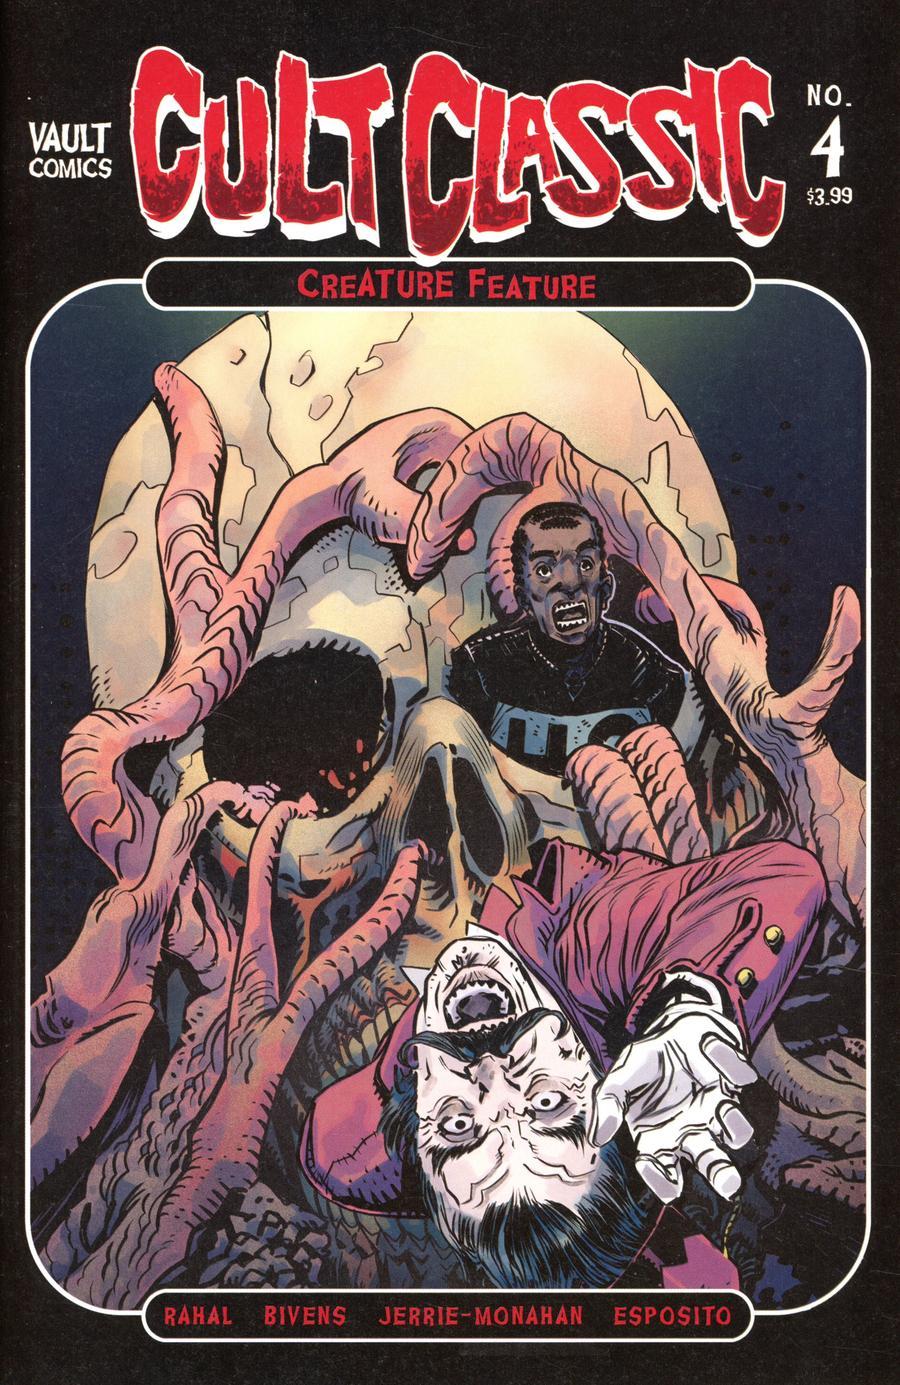 Cult Classic Creature Feature #4